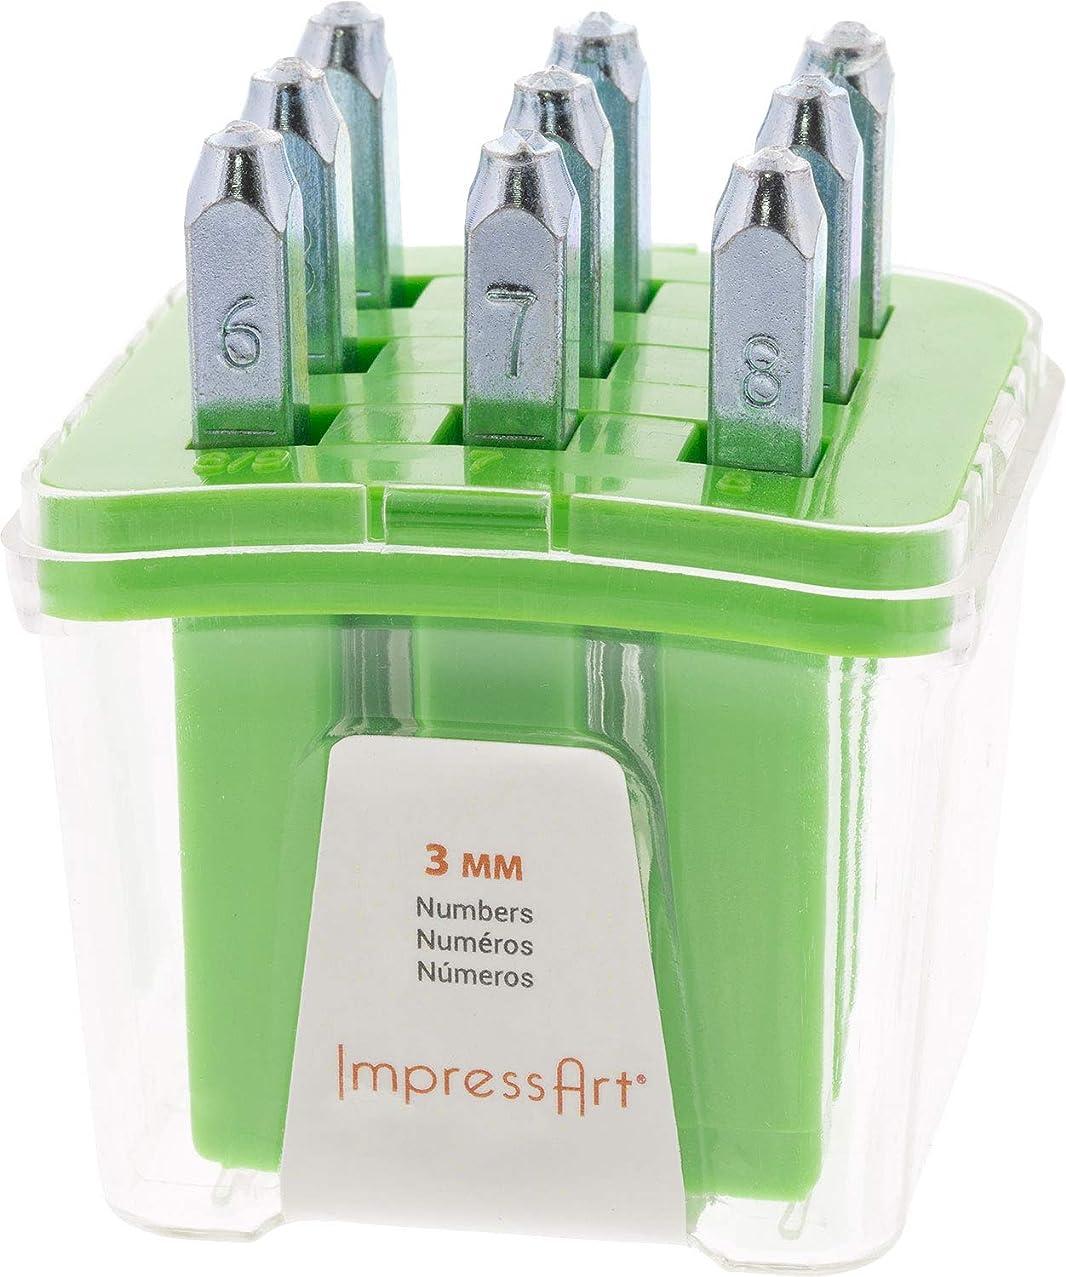 ImpressArt Premium- Newsprint Numbers Metal Stamps